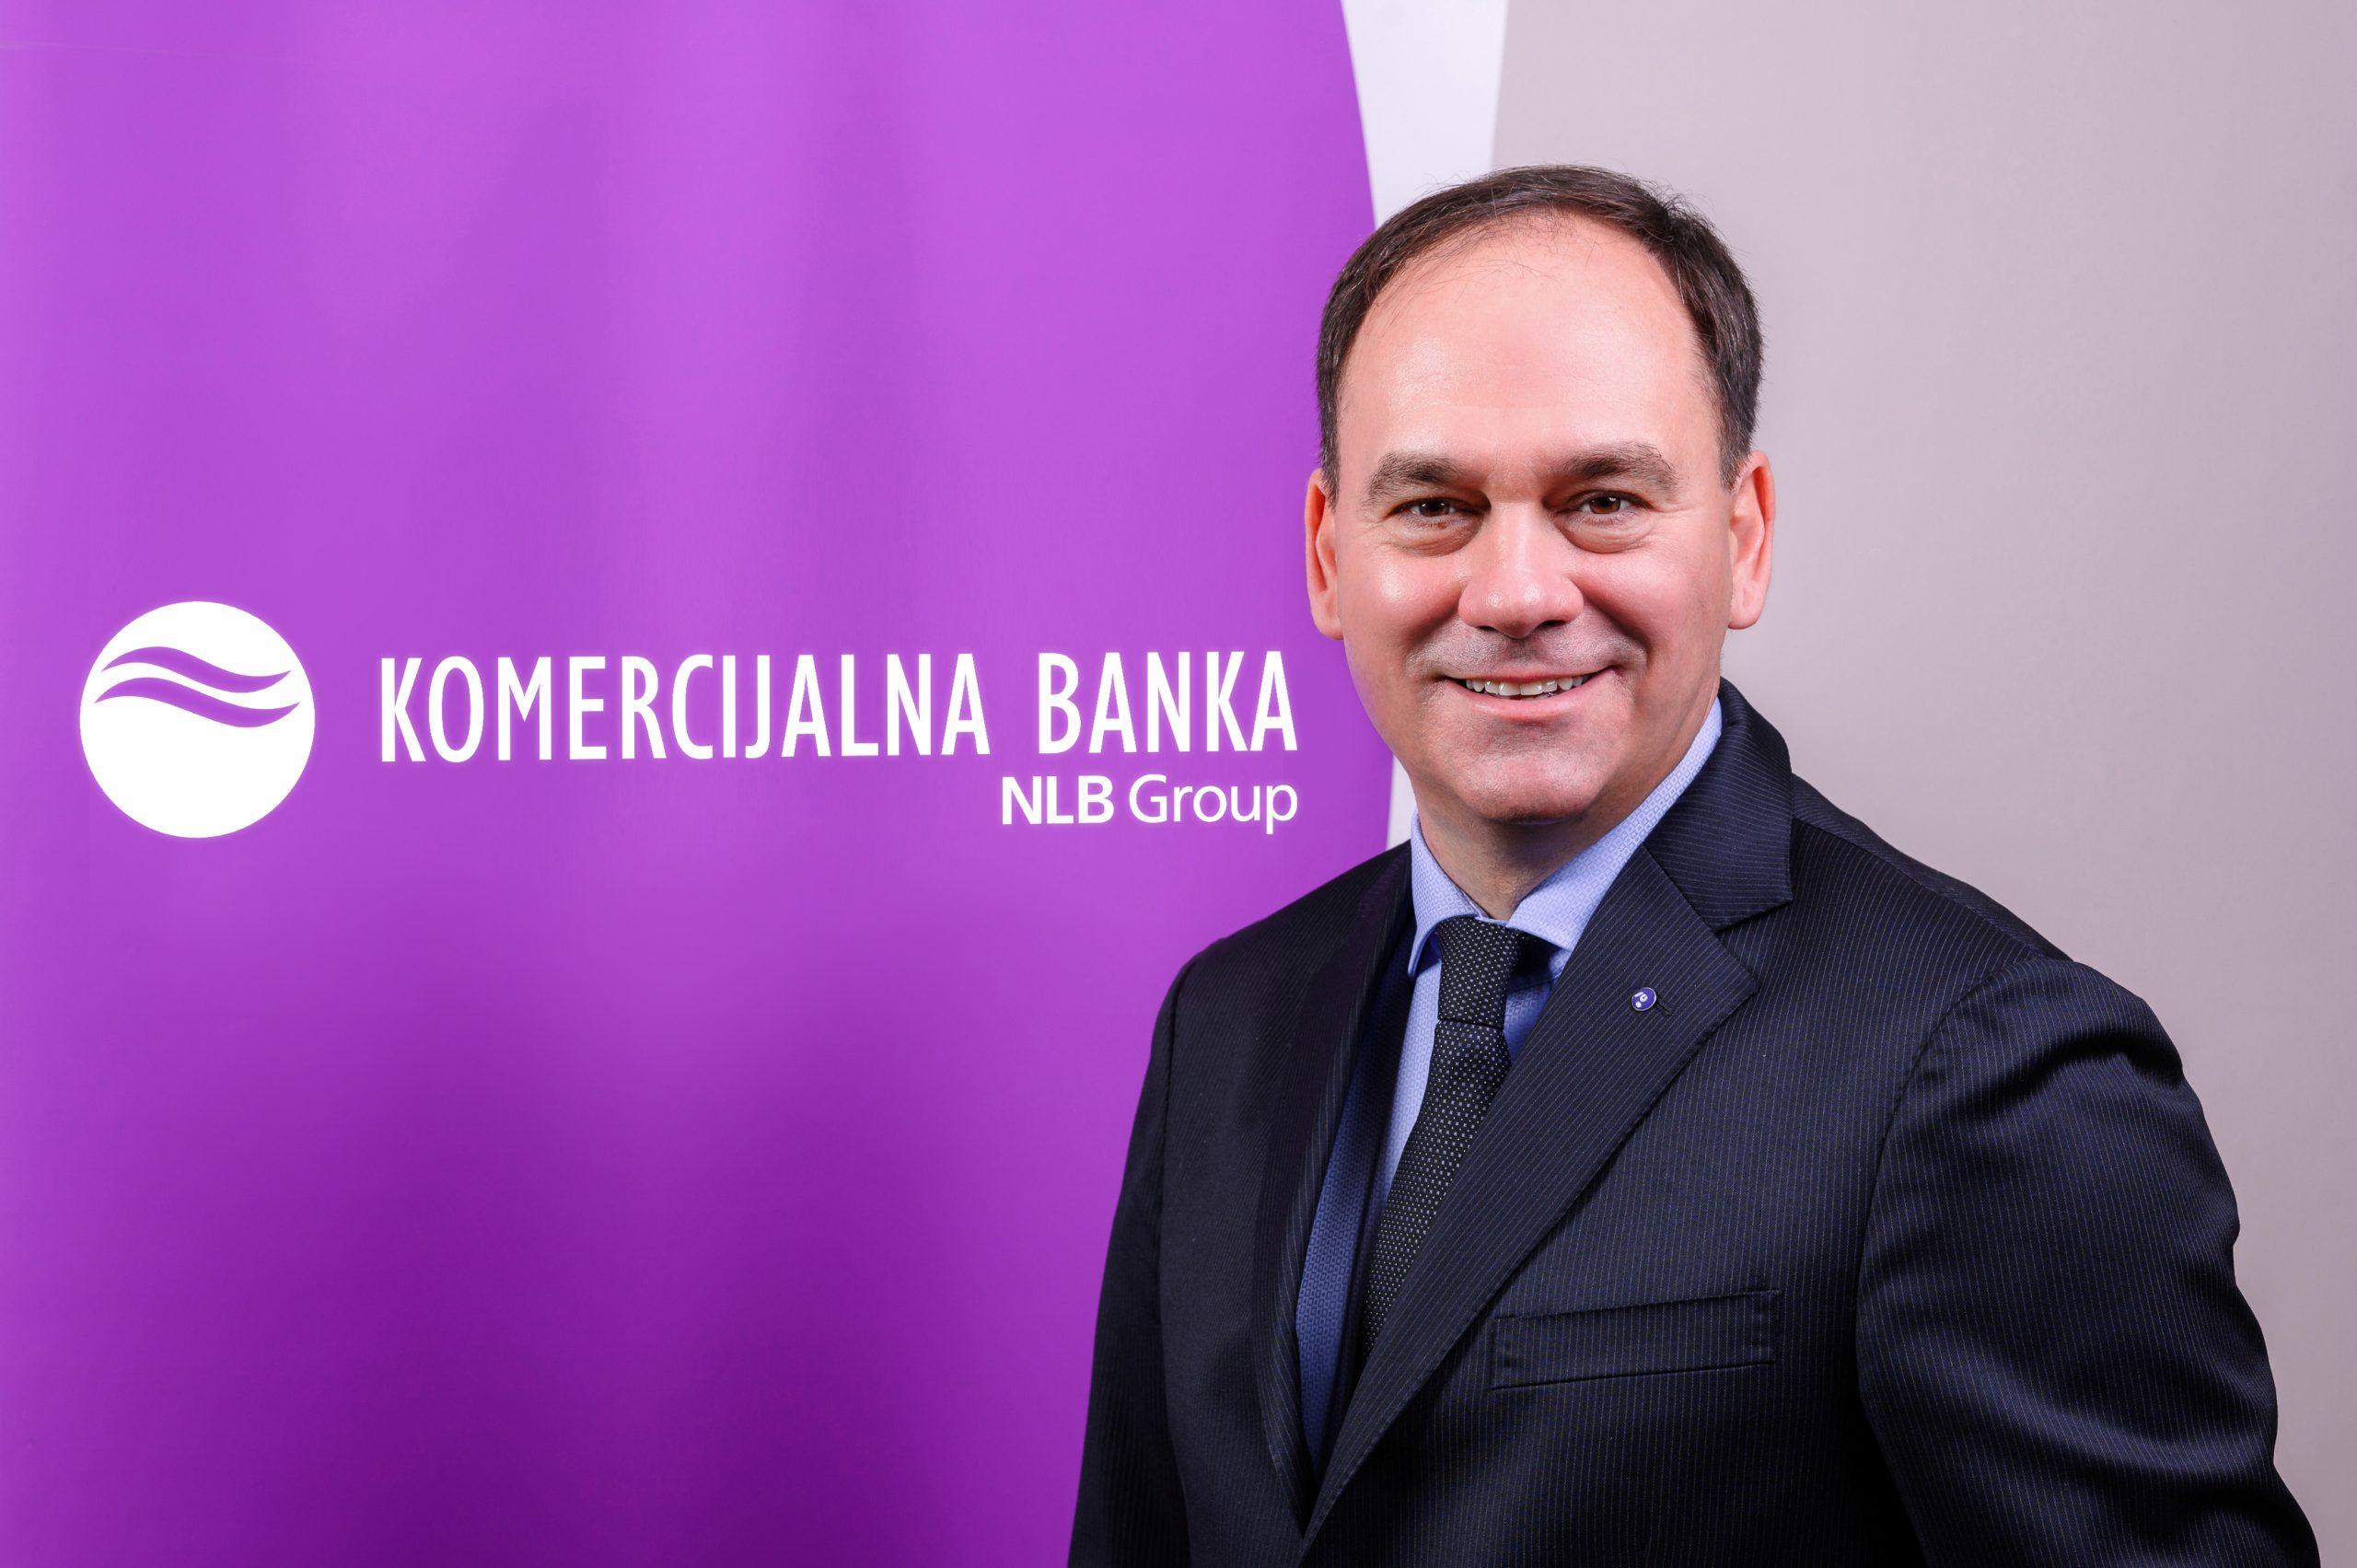 Vlastimir-Vukovic-predsednik-IO-Komercijalne-banke-